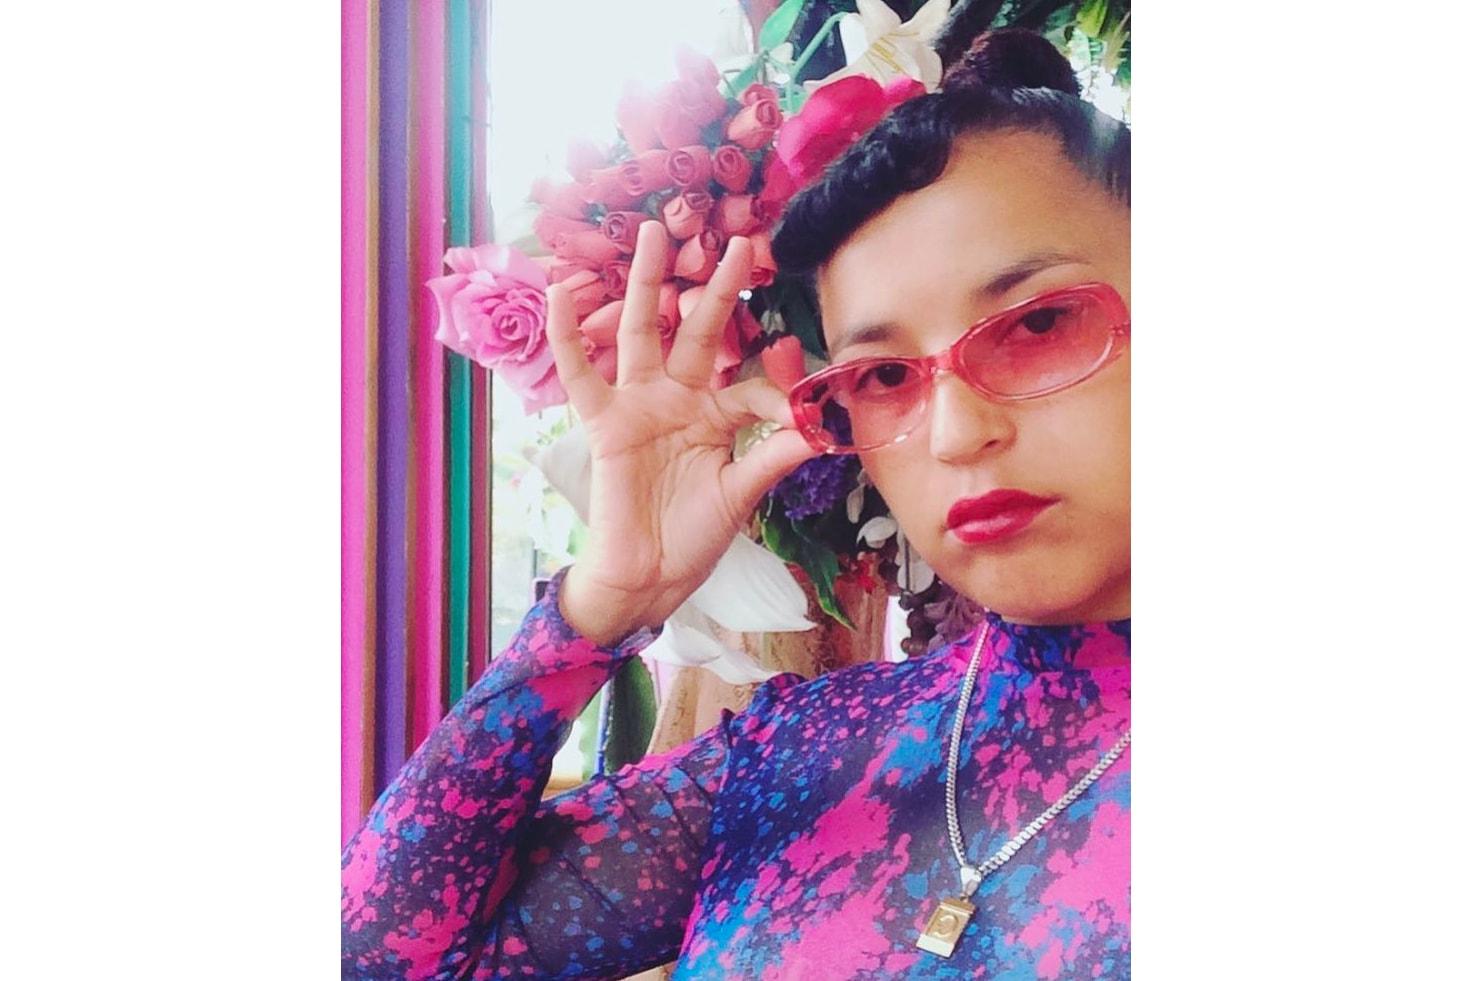 Best Female Artists Music 2018 Kehlani Kodie Shane Jorja Smith NICOTINE'S FAMOUS HONEY RAVYN LENAE fatima RAY BLK WAFIA ELLA MAI RAPSODY